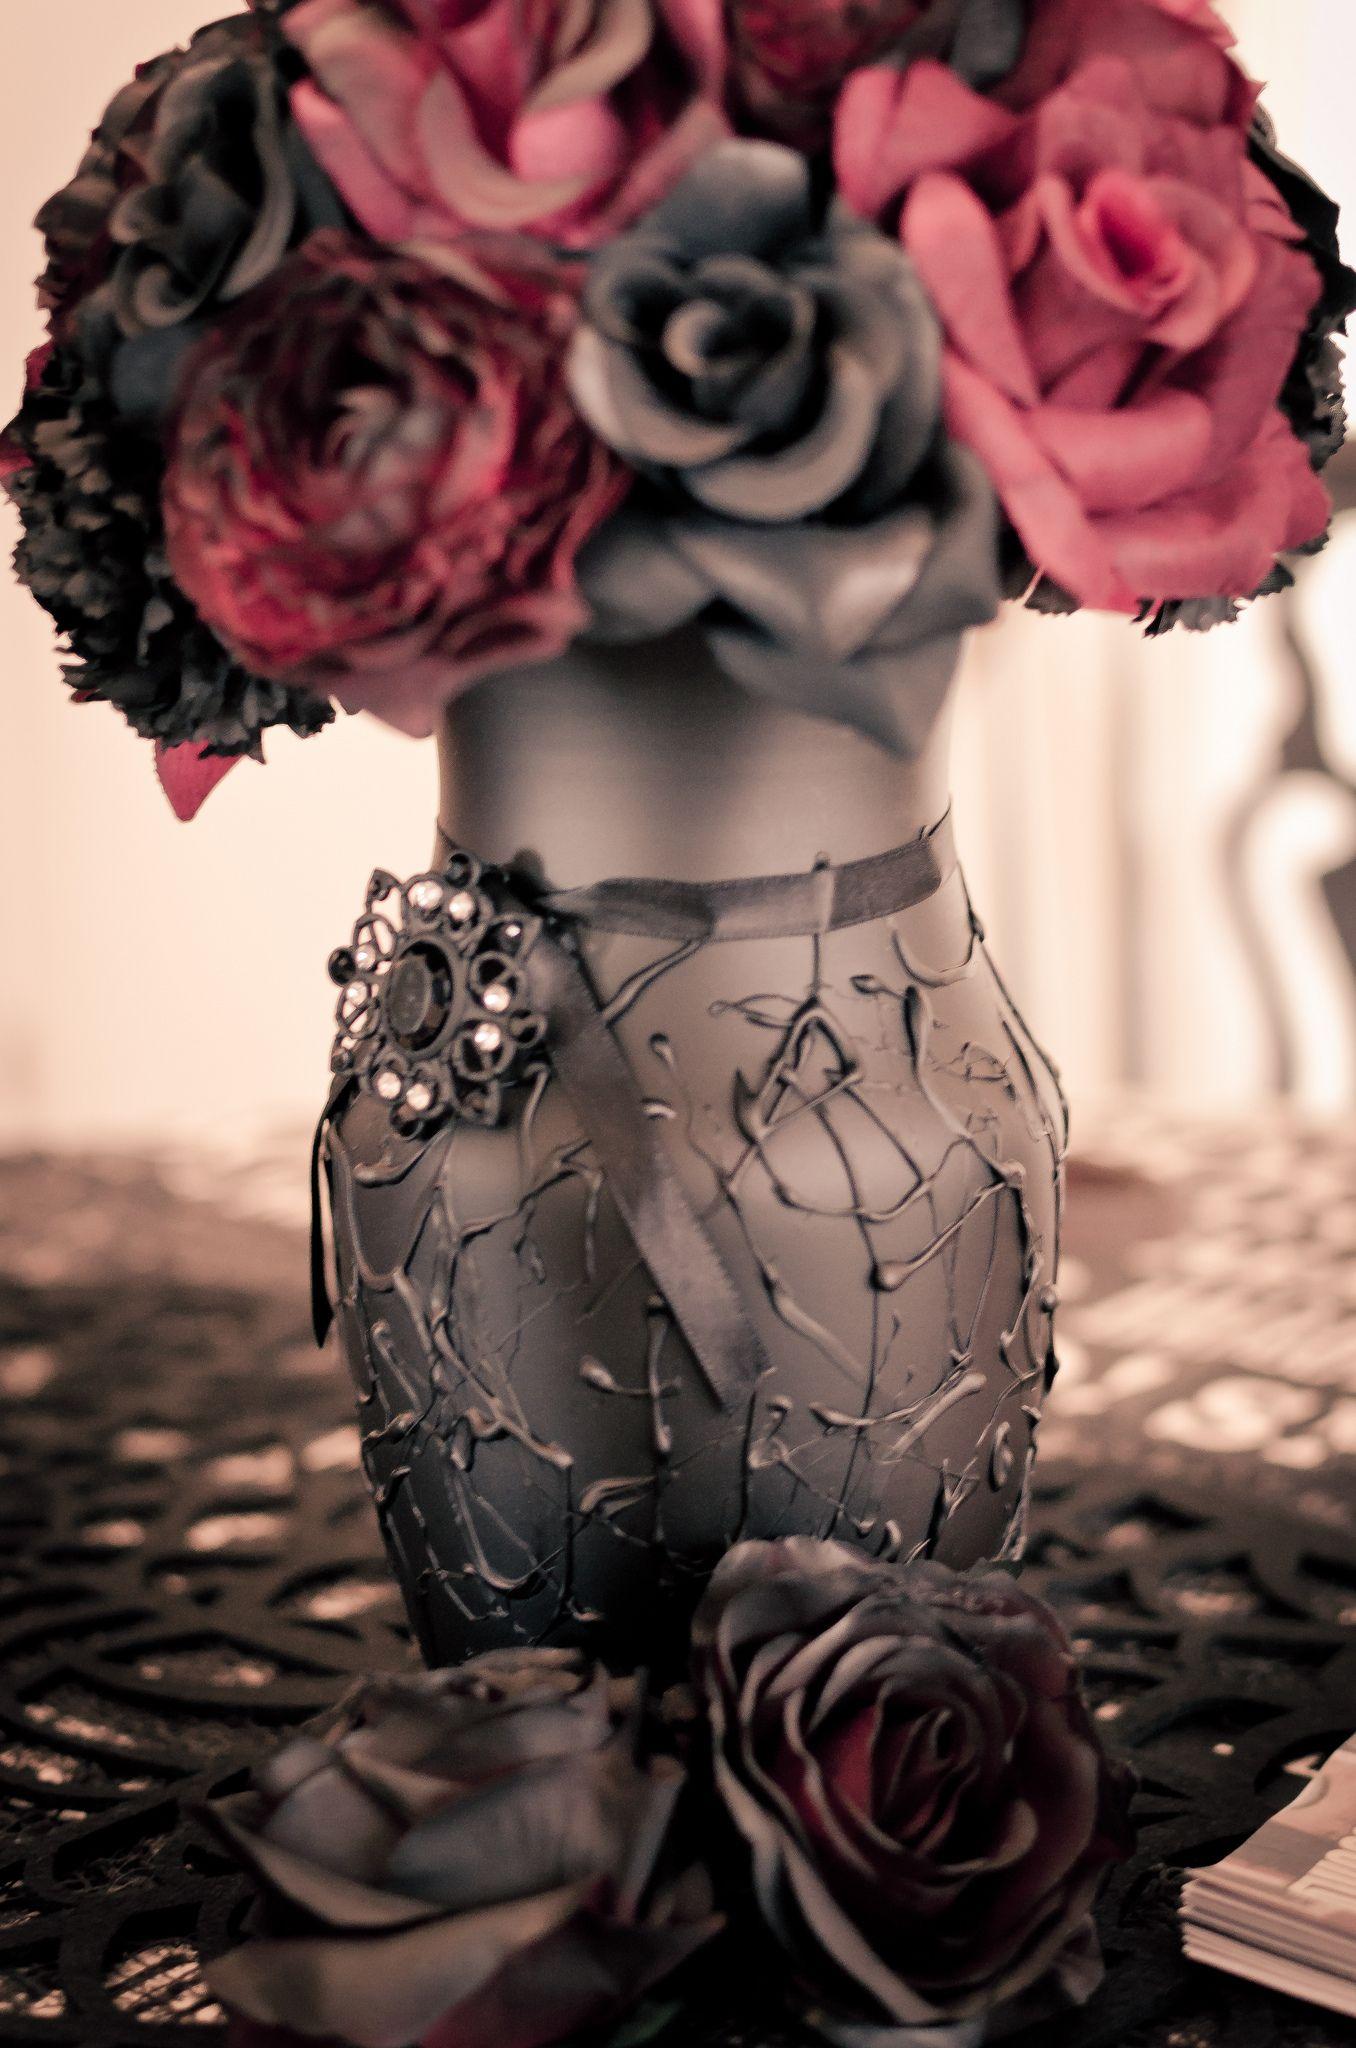 Diy halloween wedding decorations  Flickr  Halloween  Pinterest  Gothic wedding Wedding and Weddings